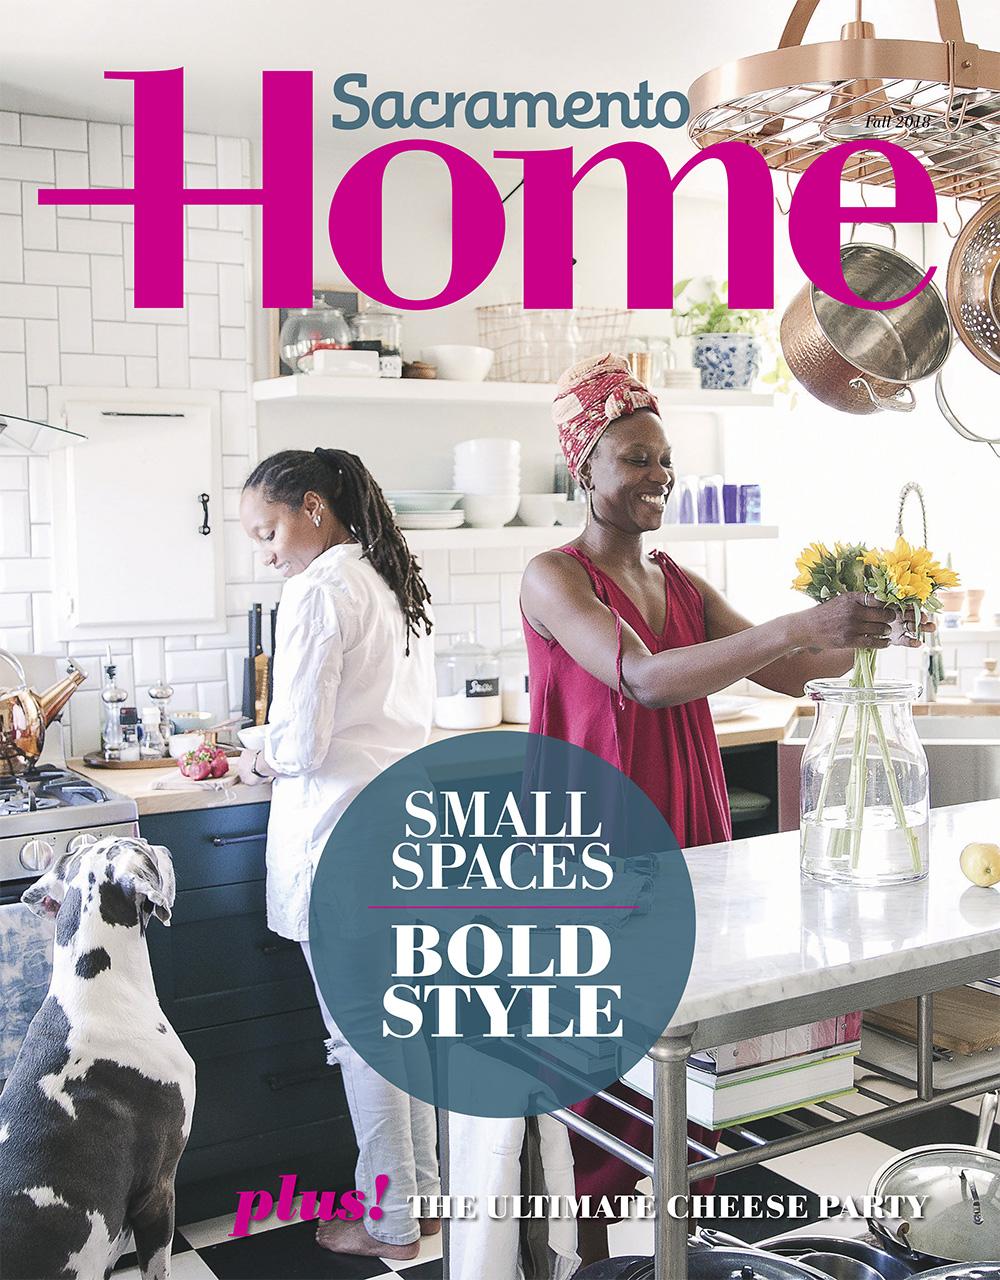 Sacramento Home Magazine Subscription Renewal